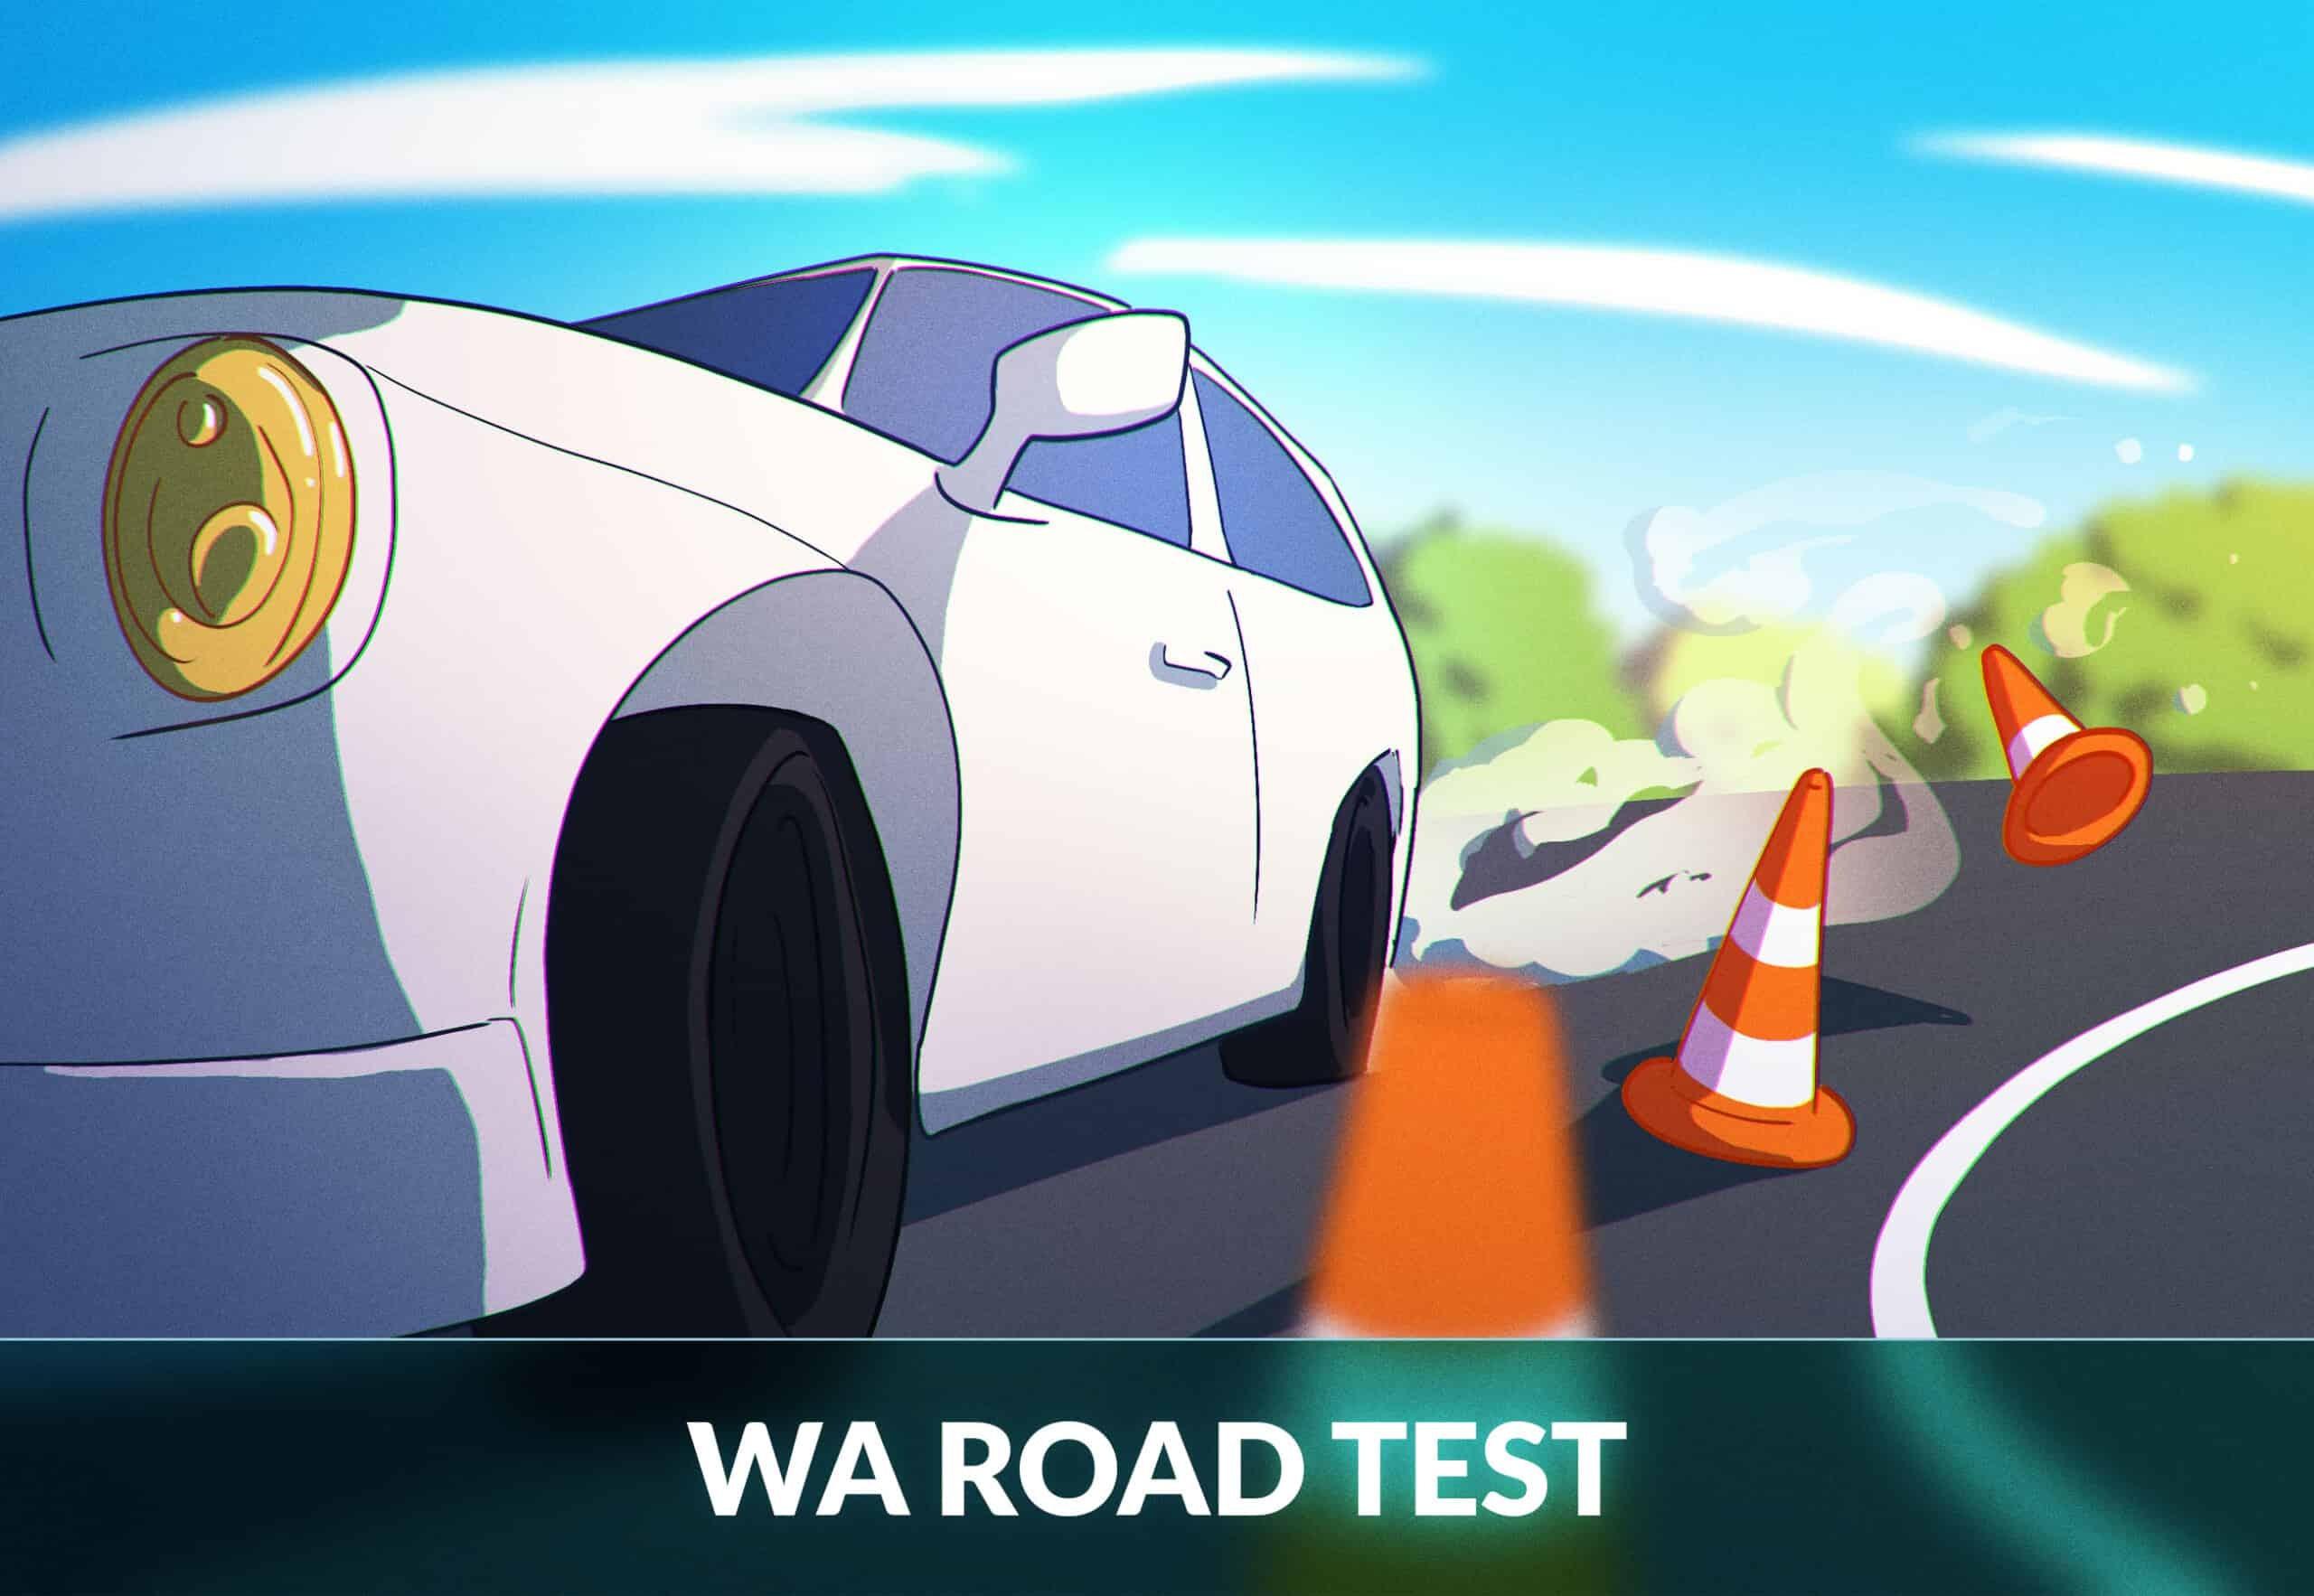 Washington Road Test